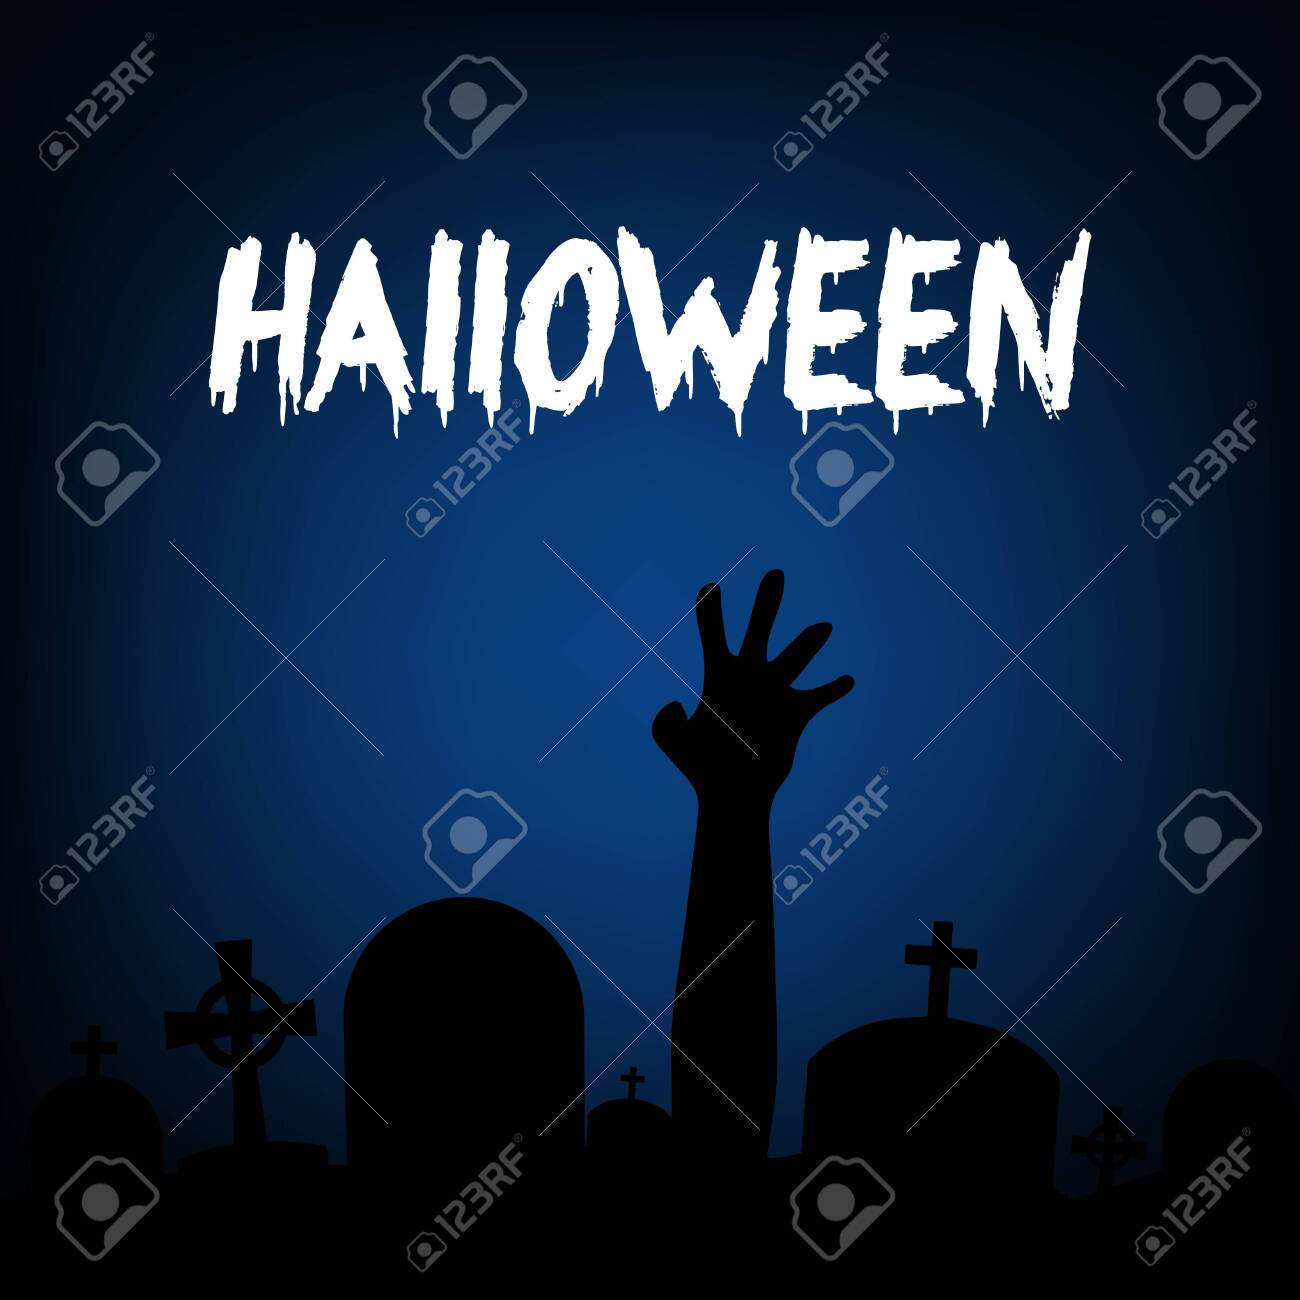 Halloween Zombie Party Invitation Card Vector Design